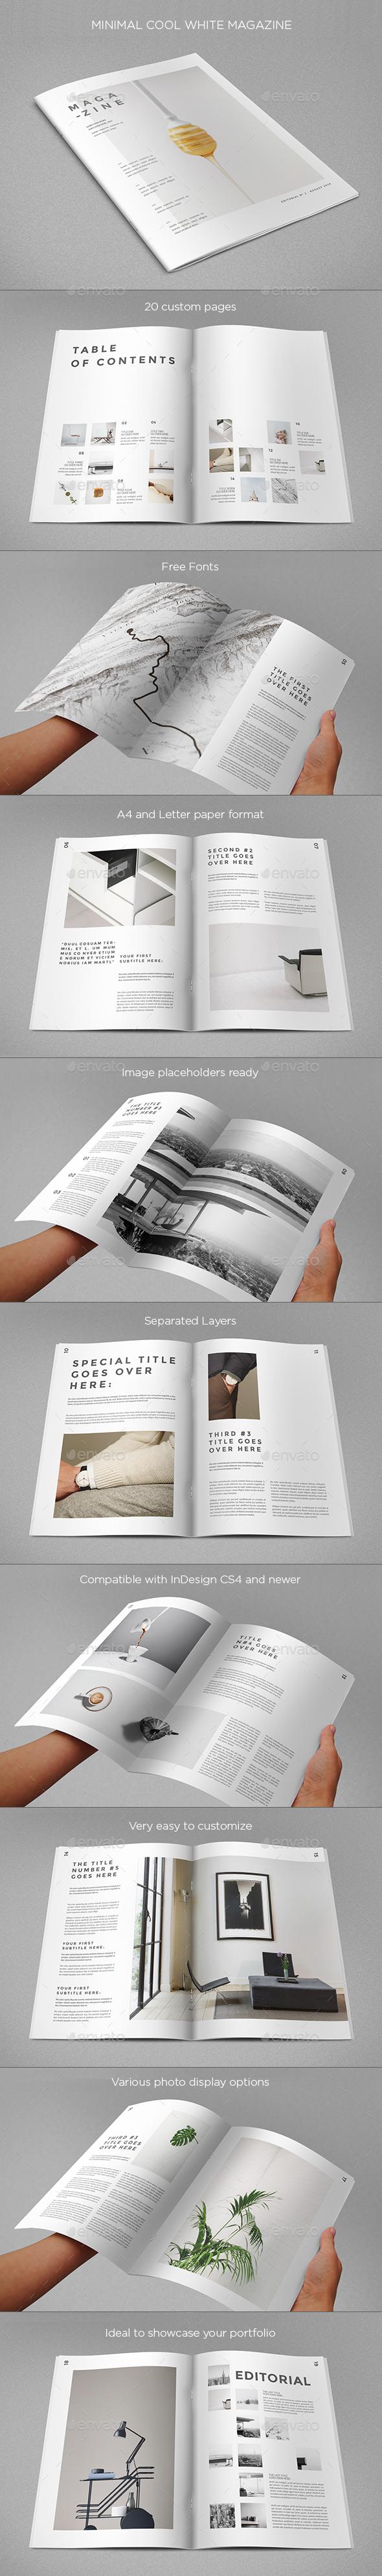 Minimal Cool White Magazine - Magazines Print Templates